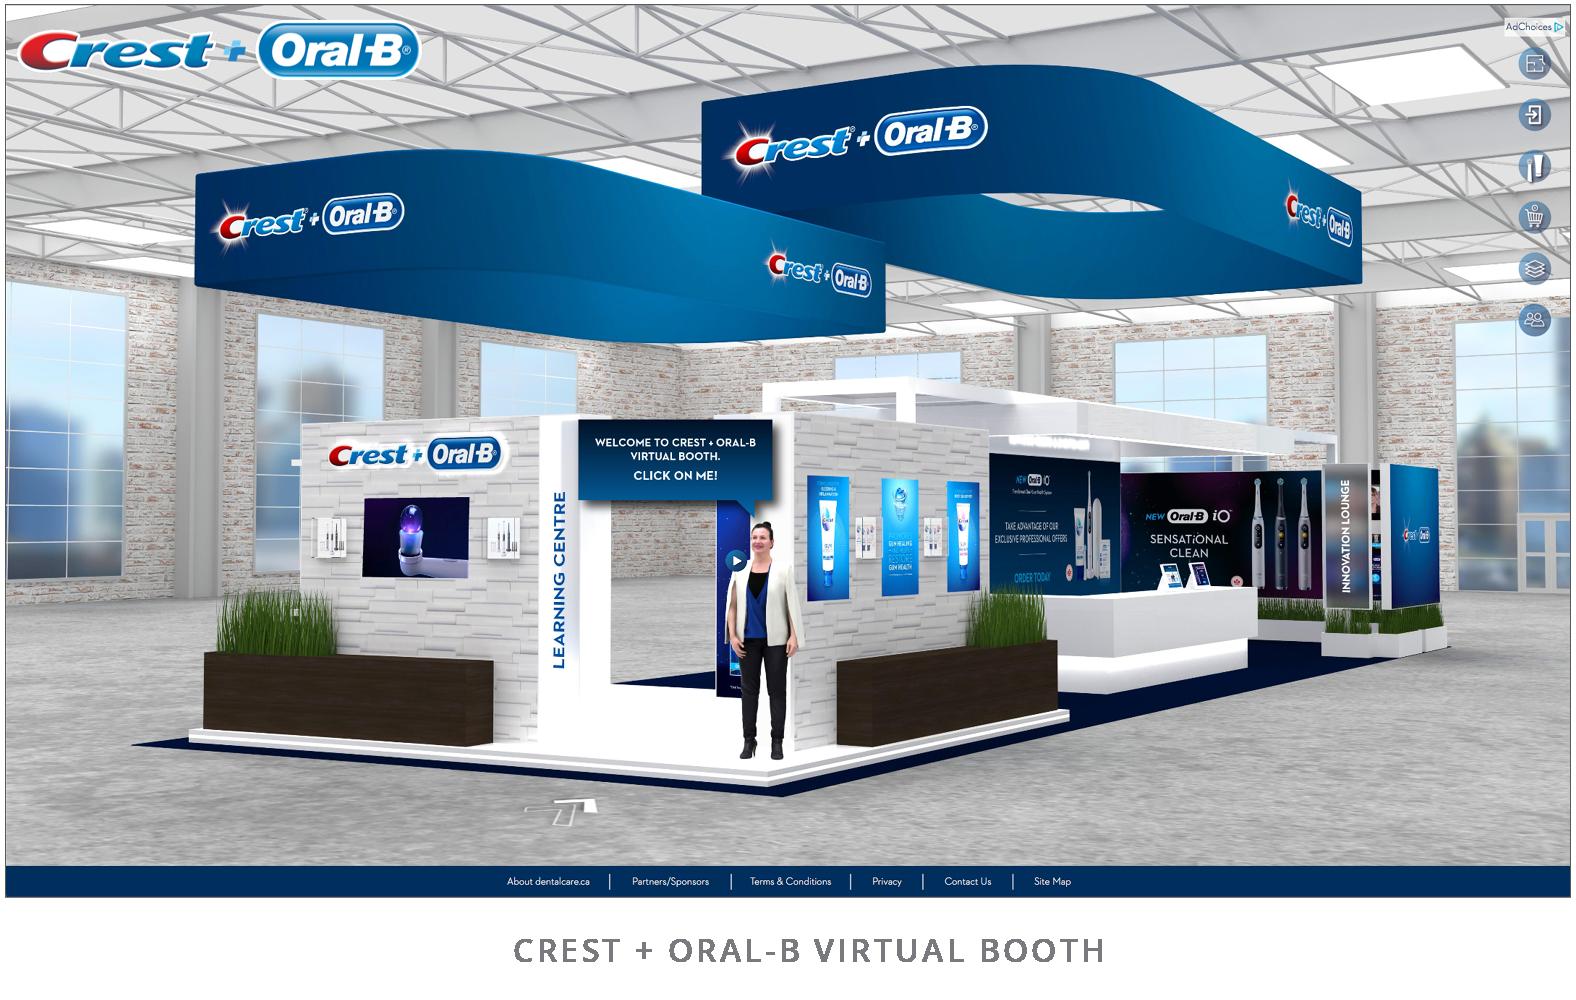 Crest+Oral-B Virtual Booth